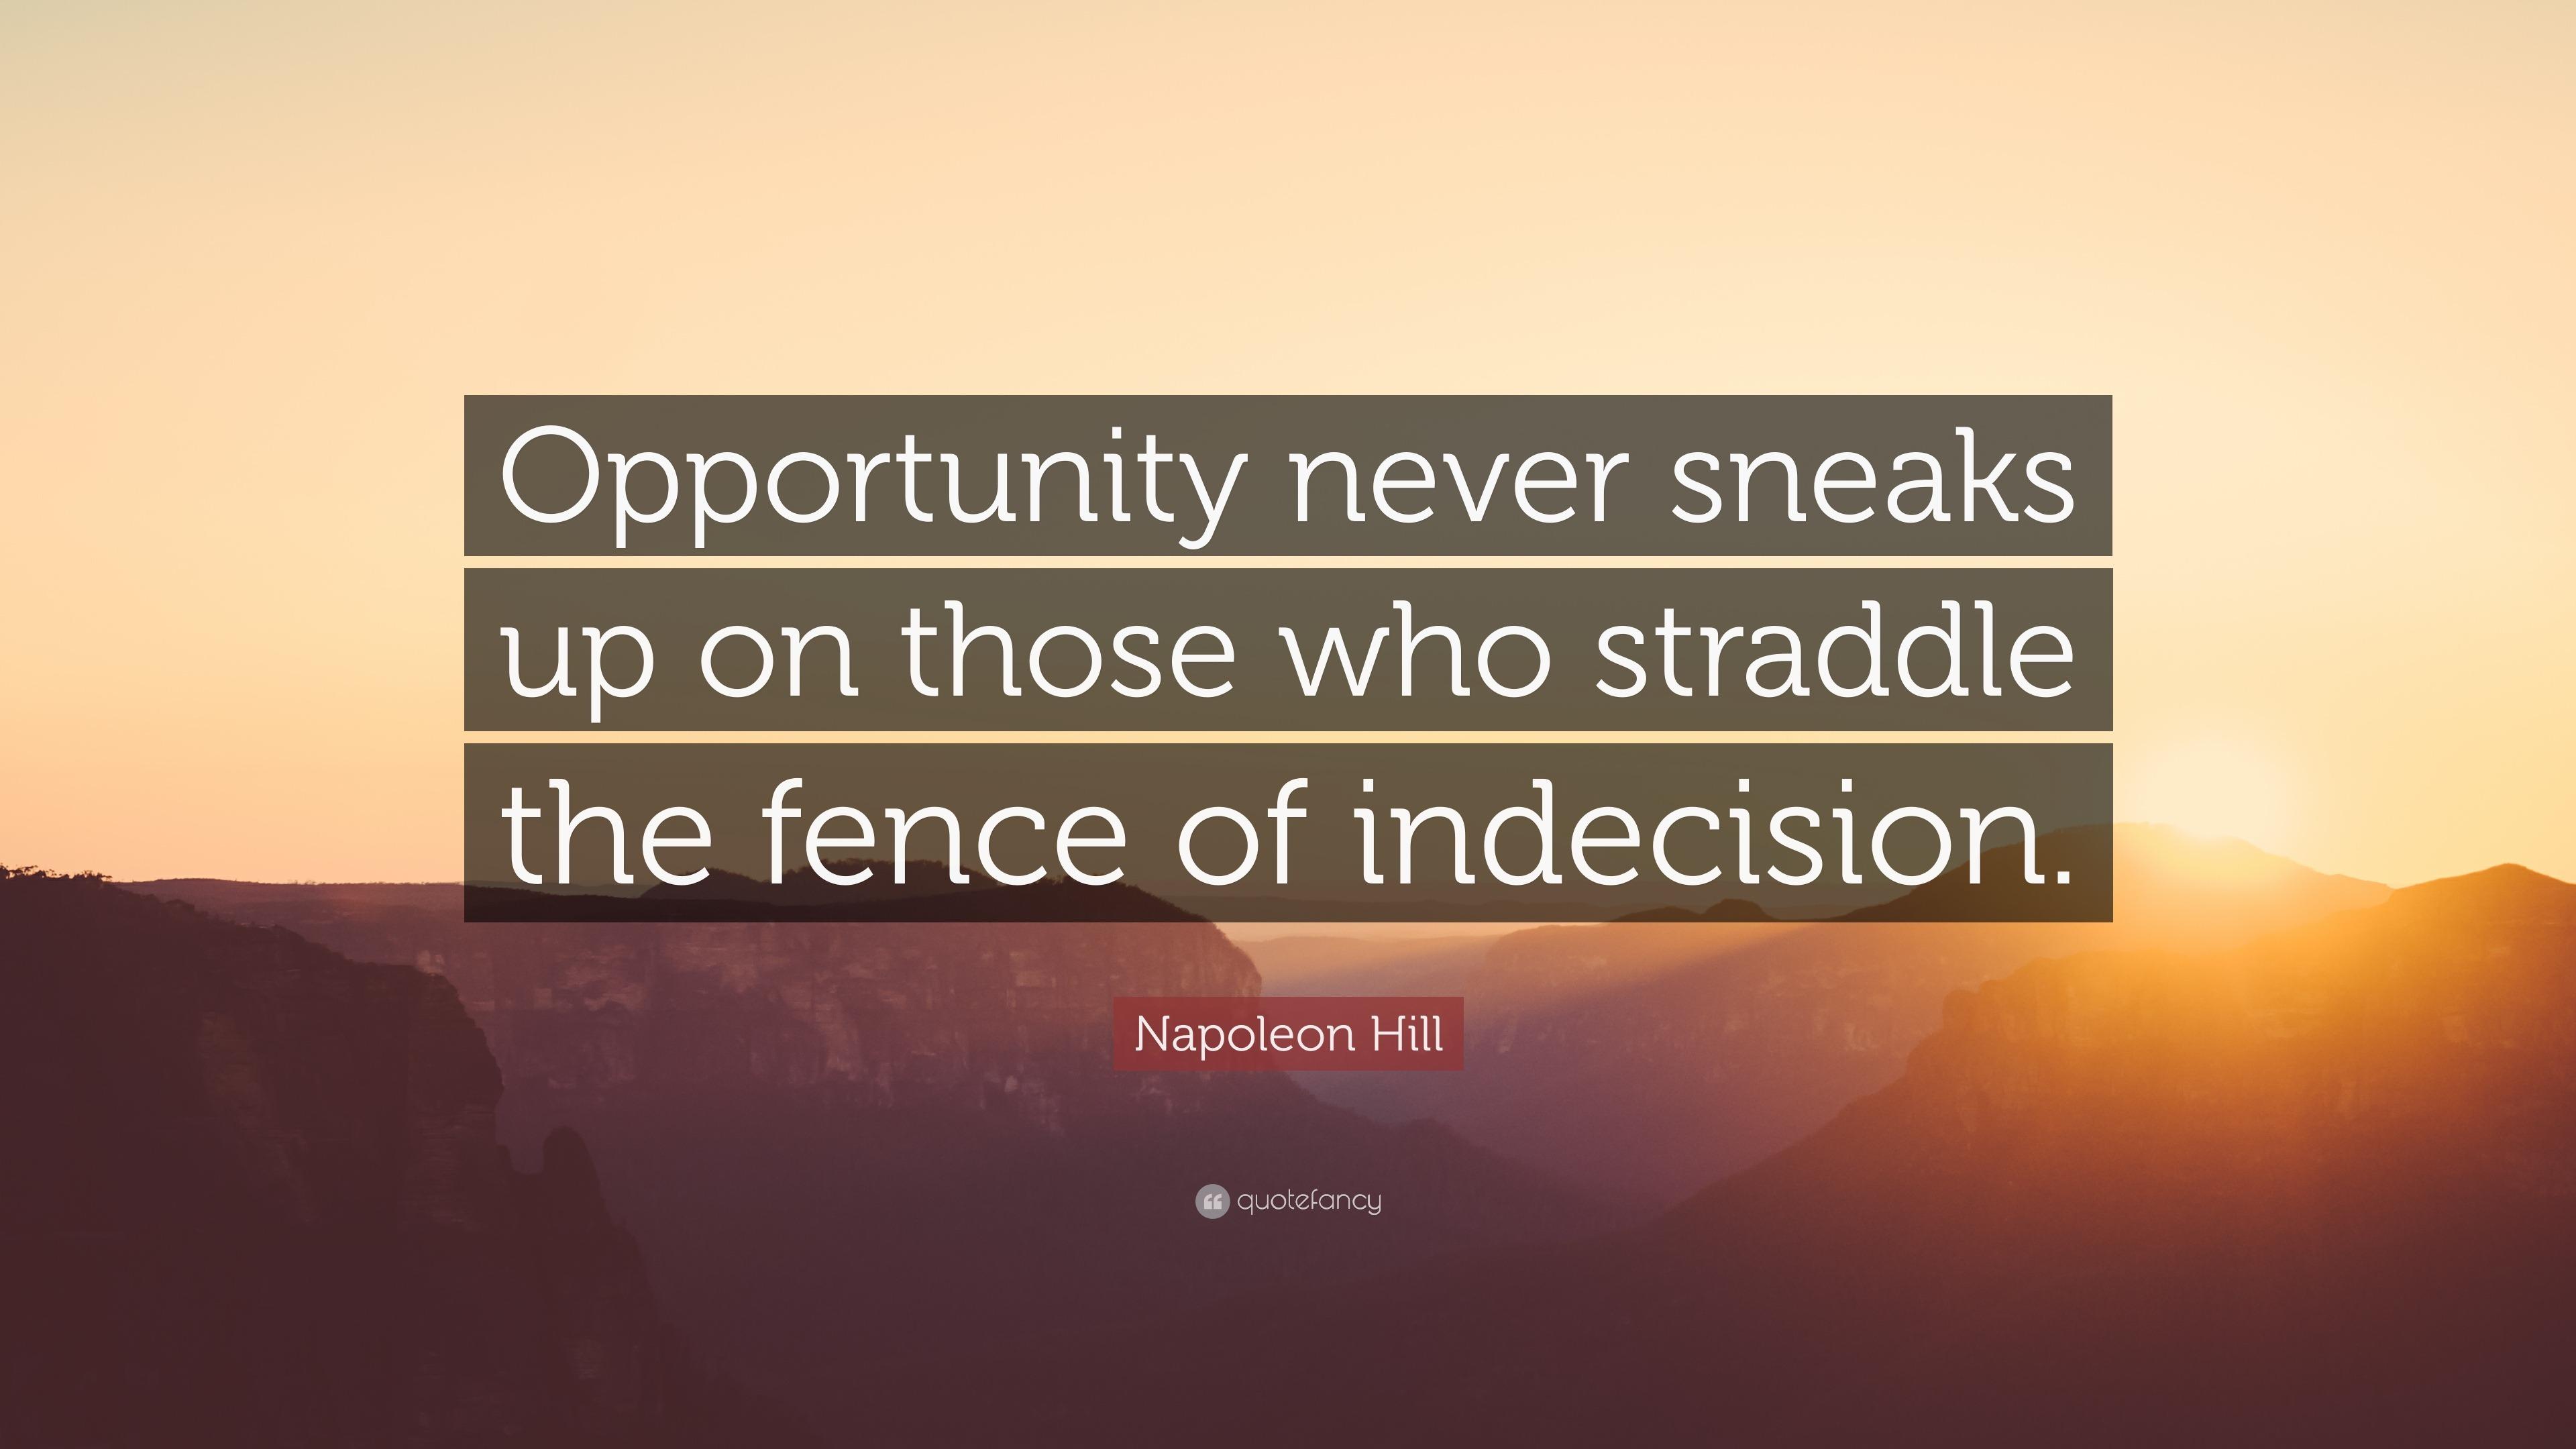 napoleon hill quote opportunity